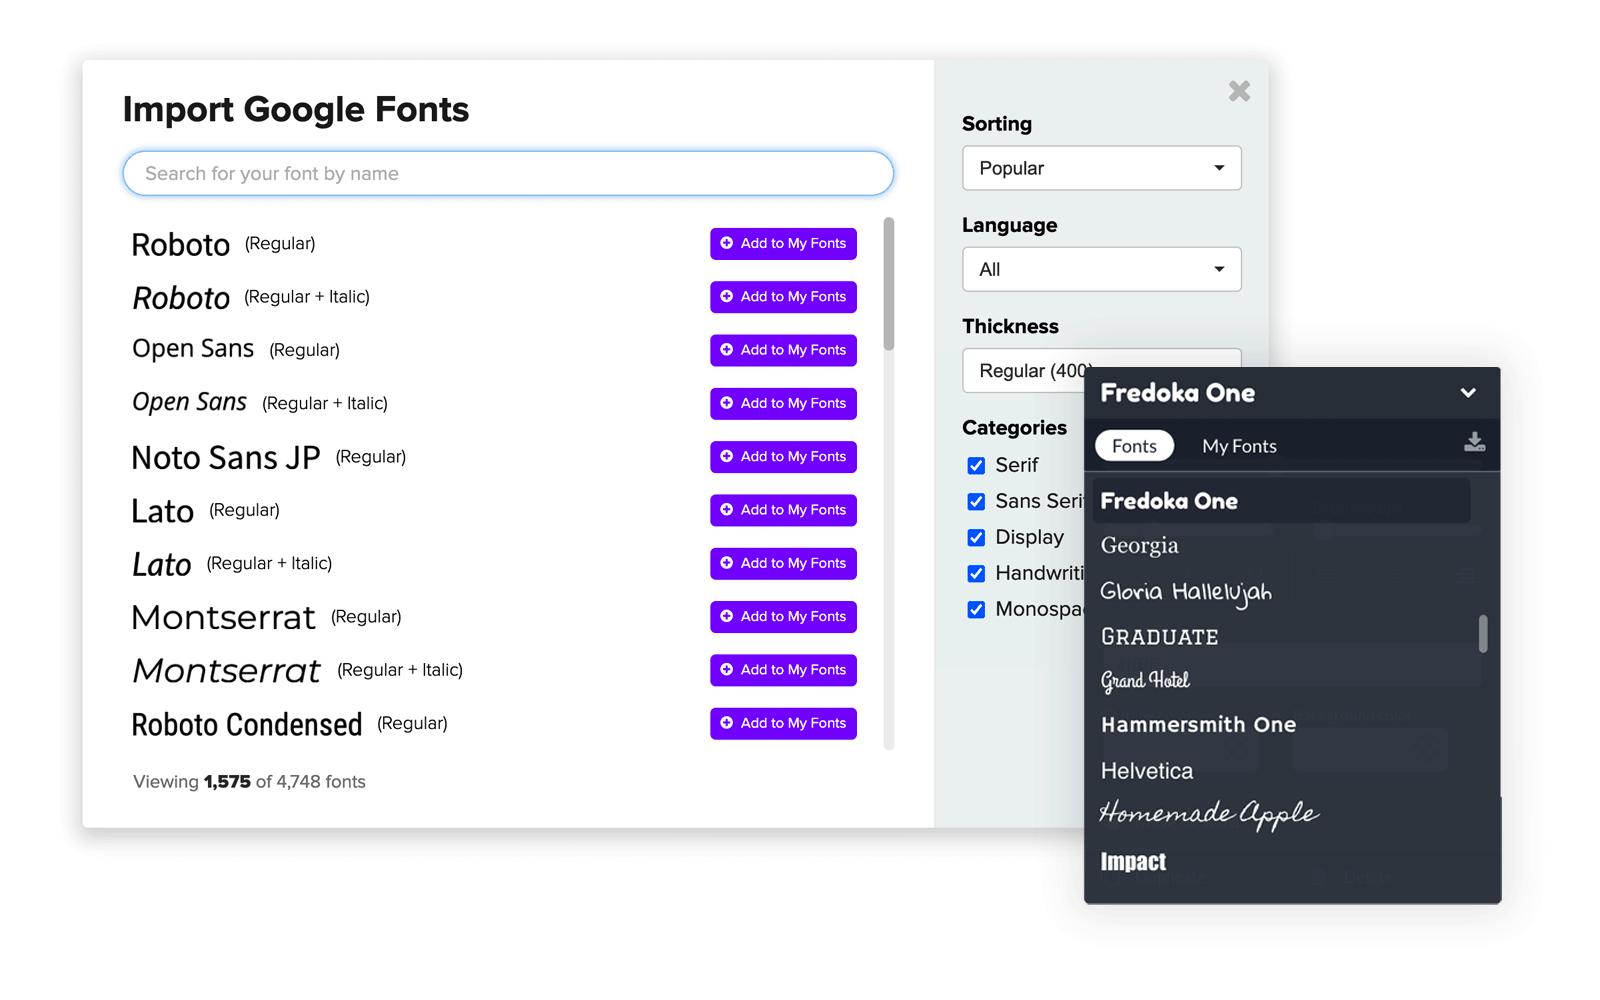 Import Google Fonts